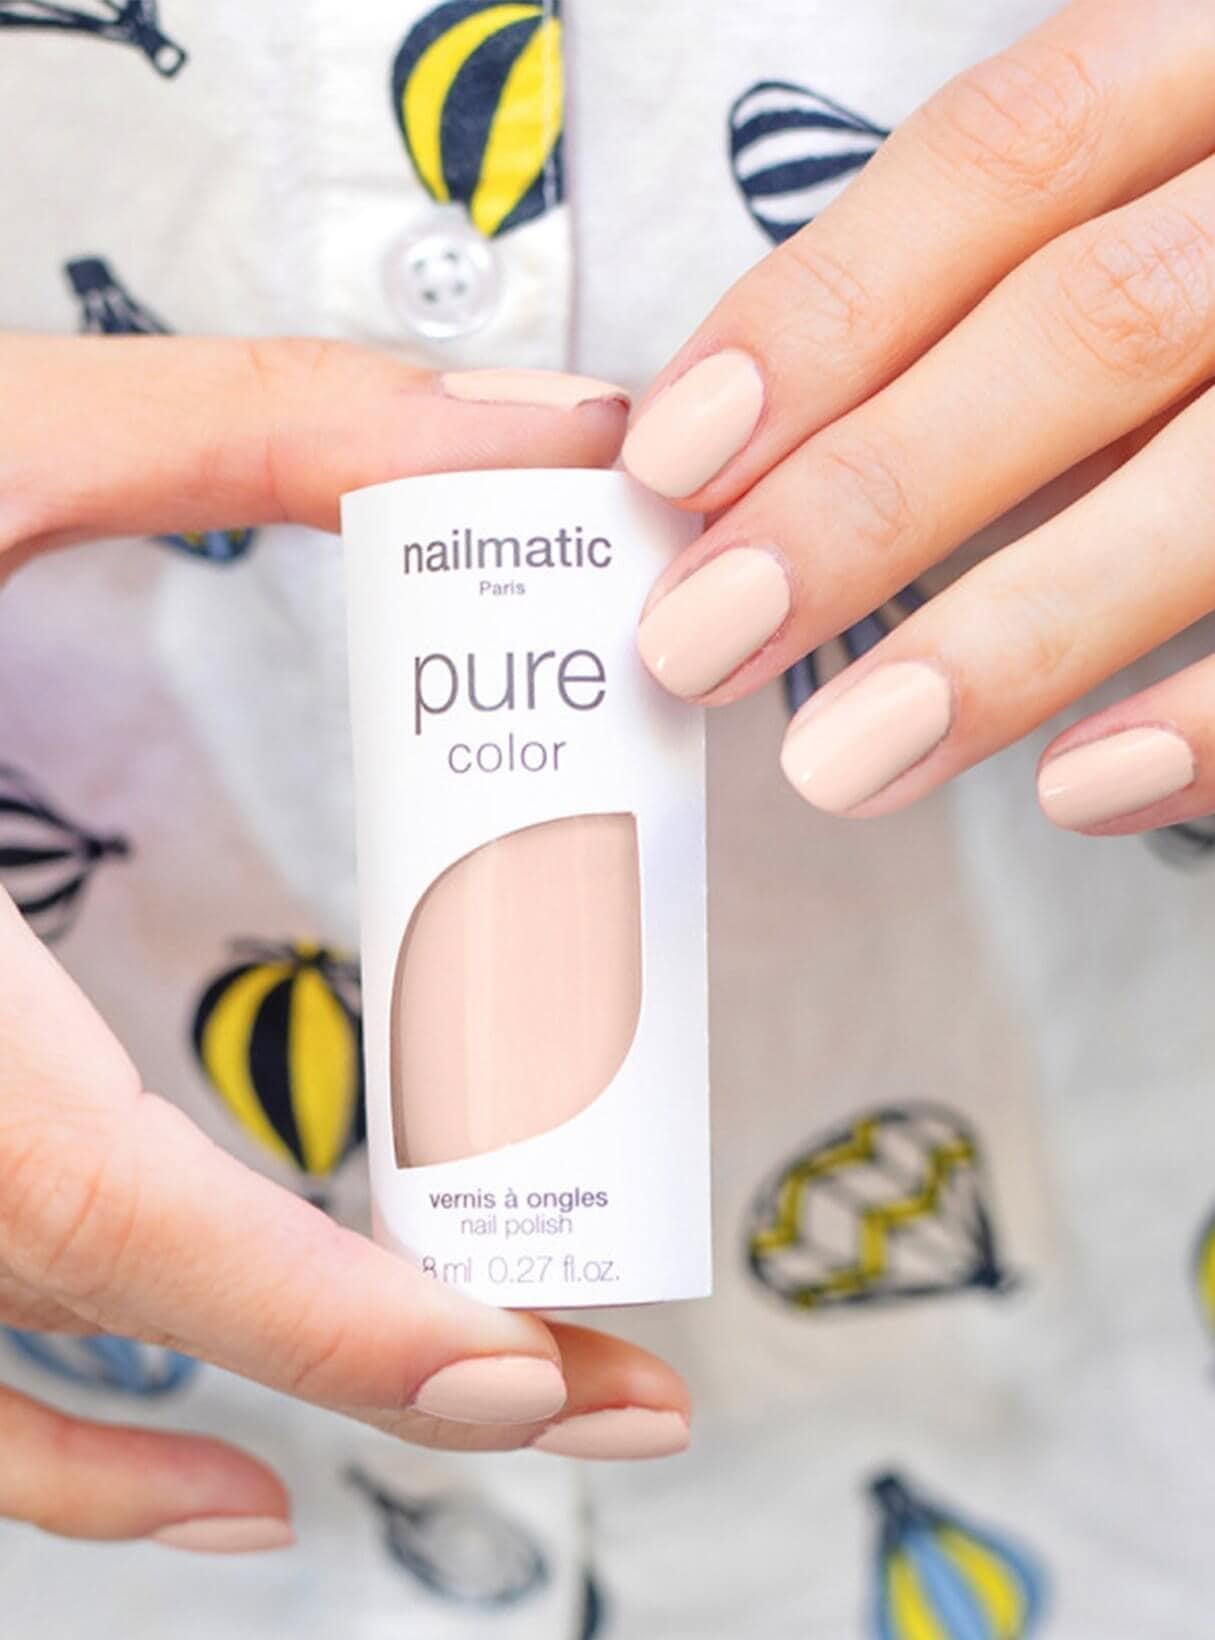 Nailmatic Vegan Nail polish OuiPlease Oui Beauty Blog